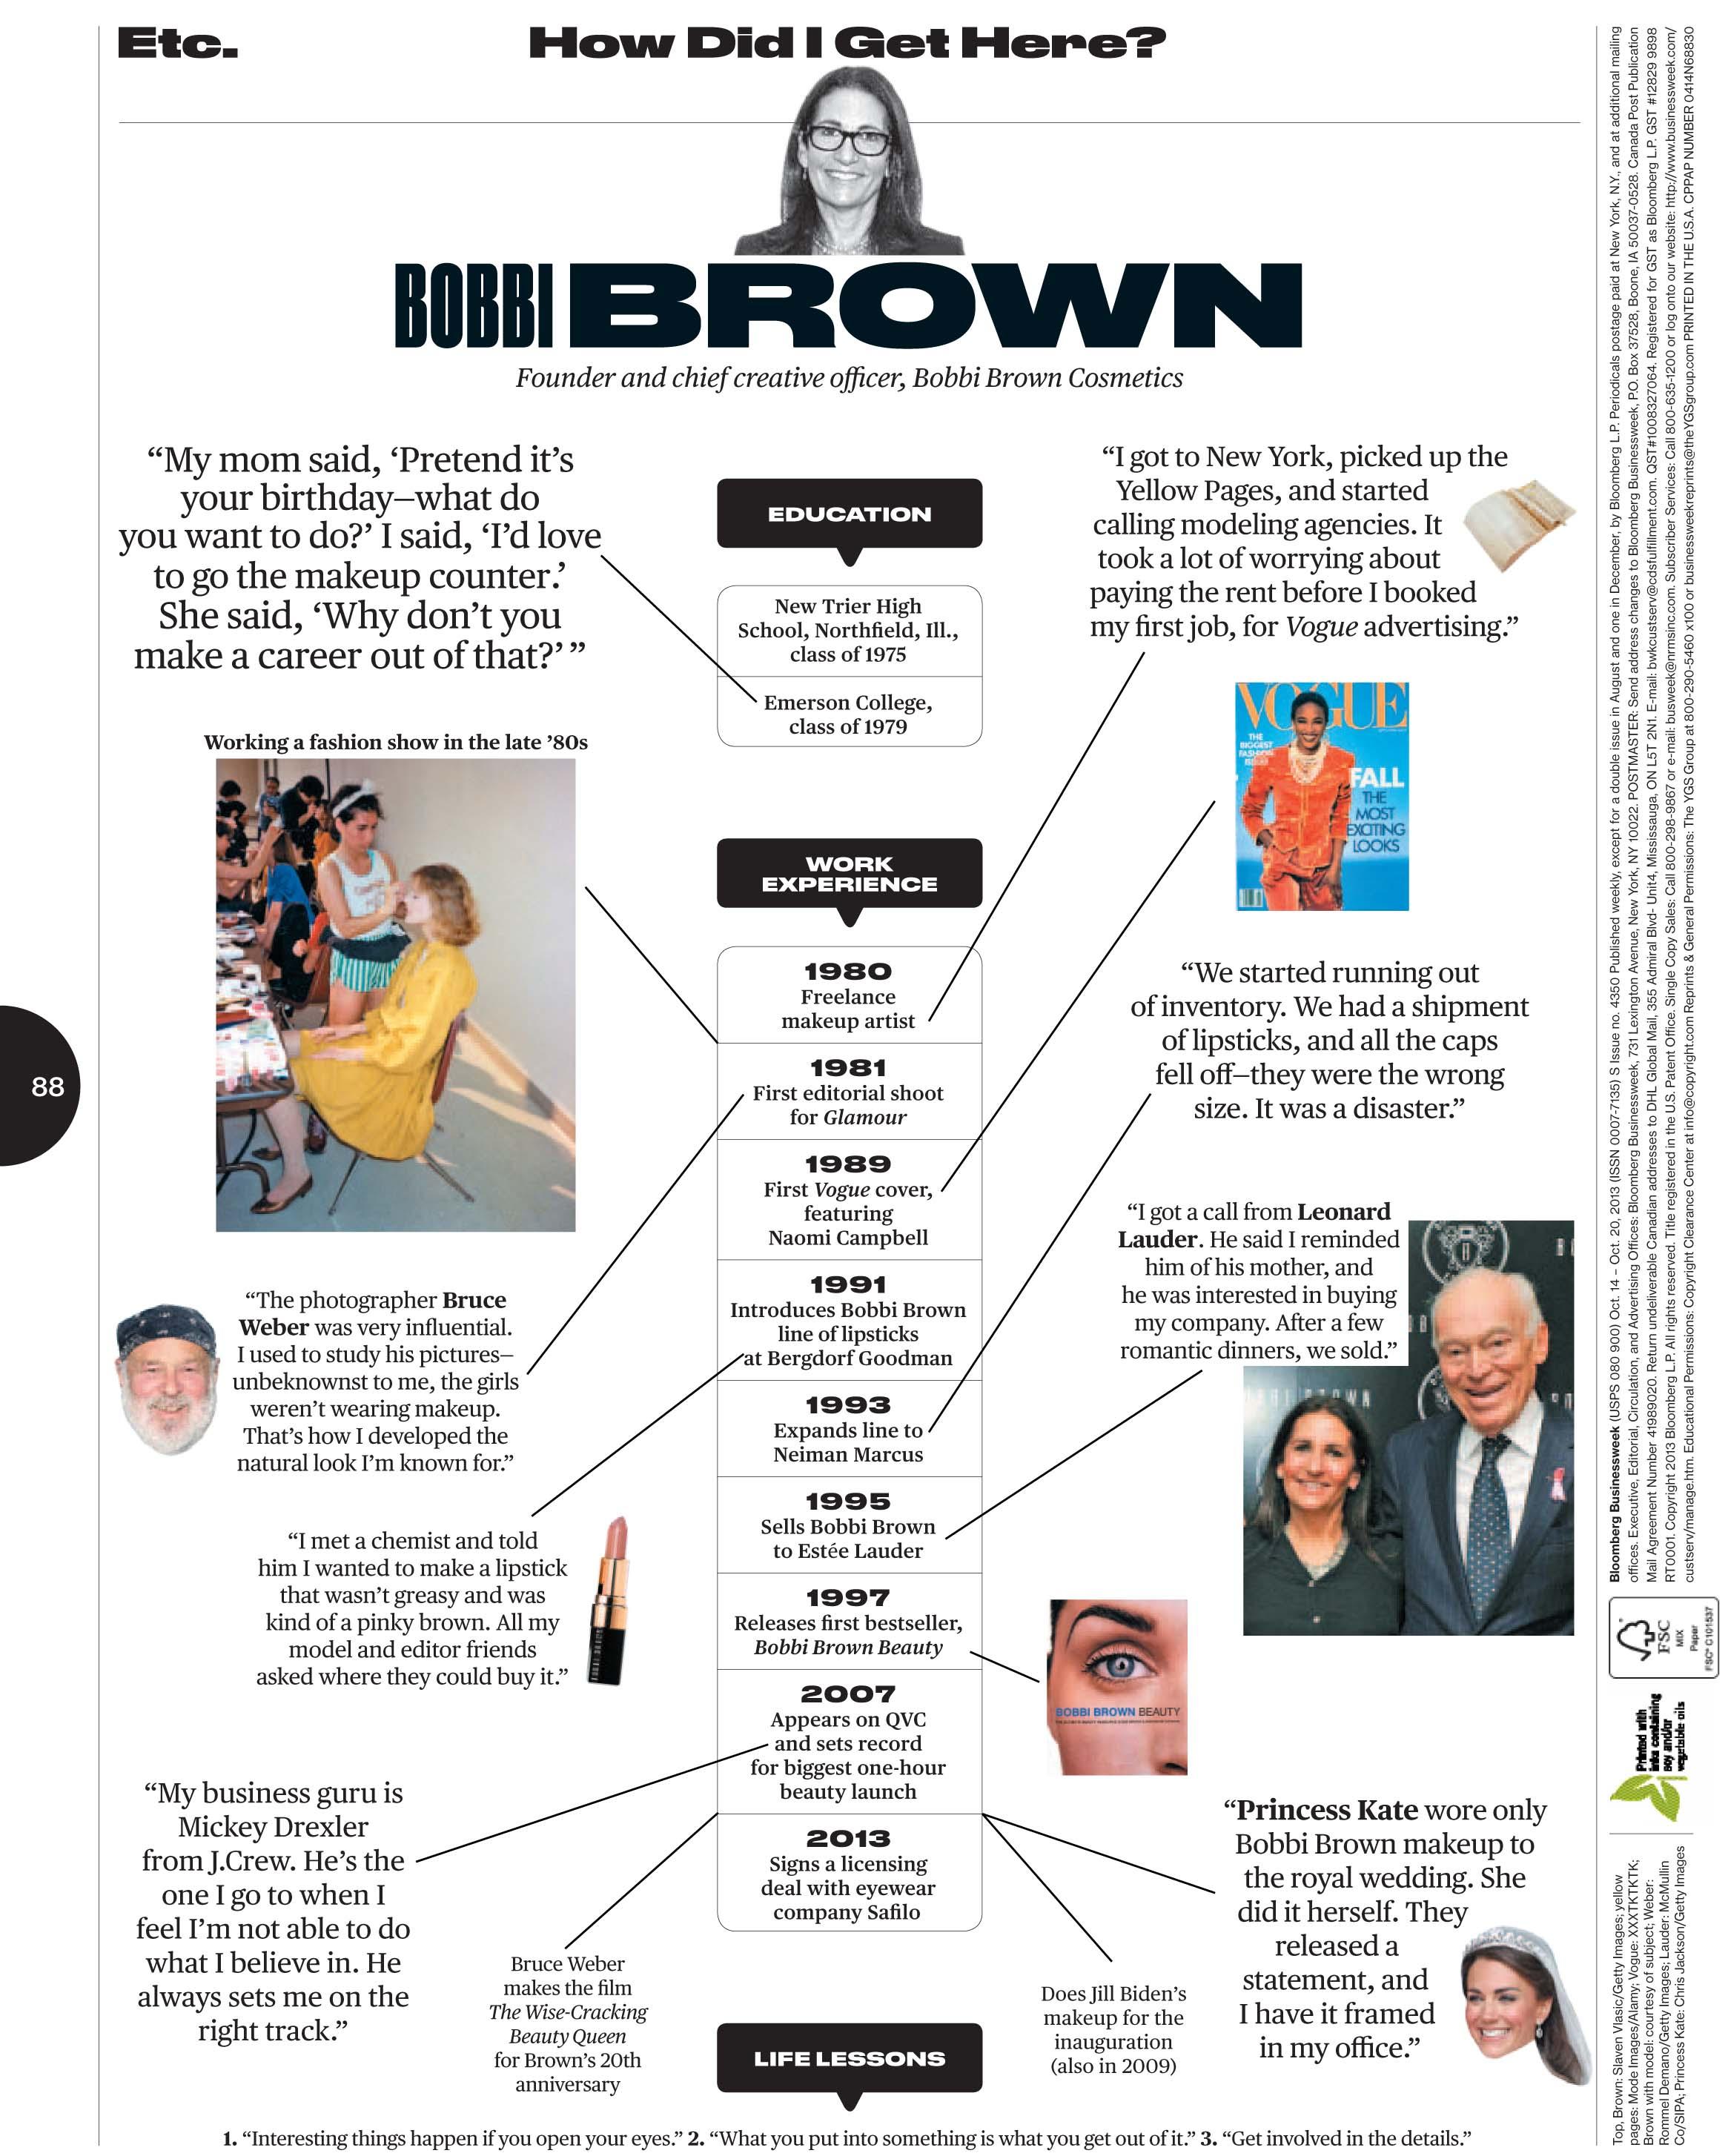 Bloomberg Businessweek - How Did I Get Here 10.jpg